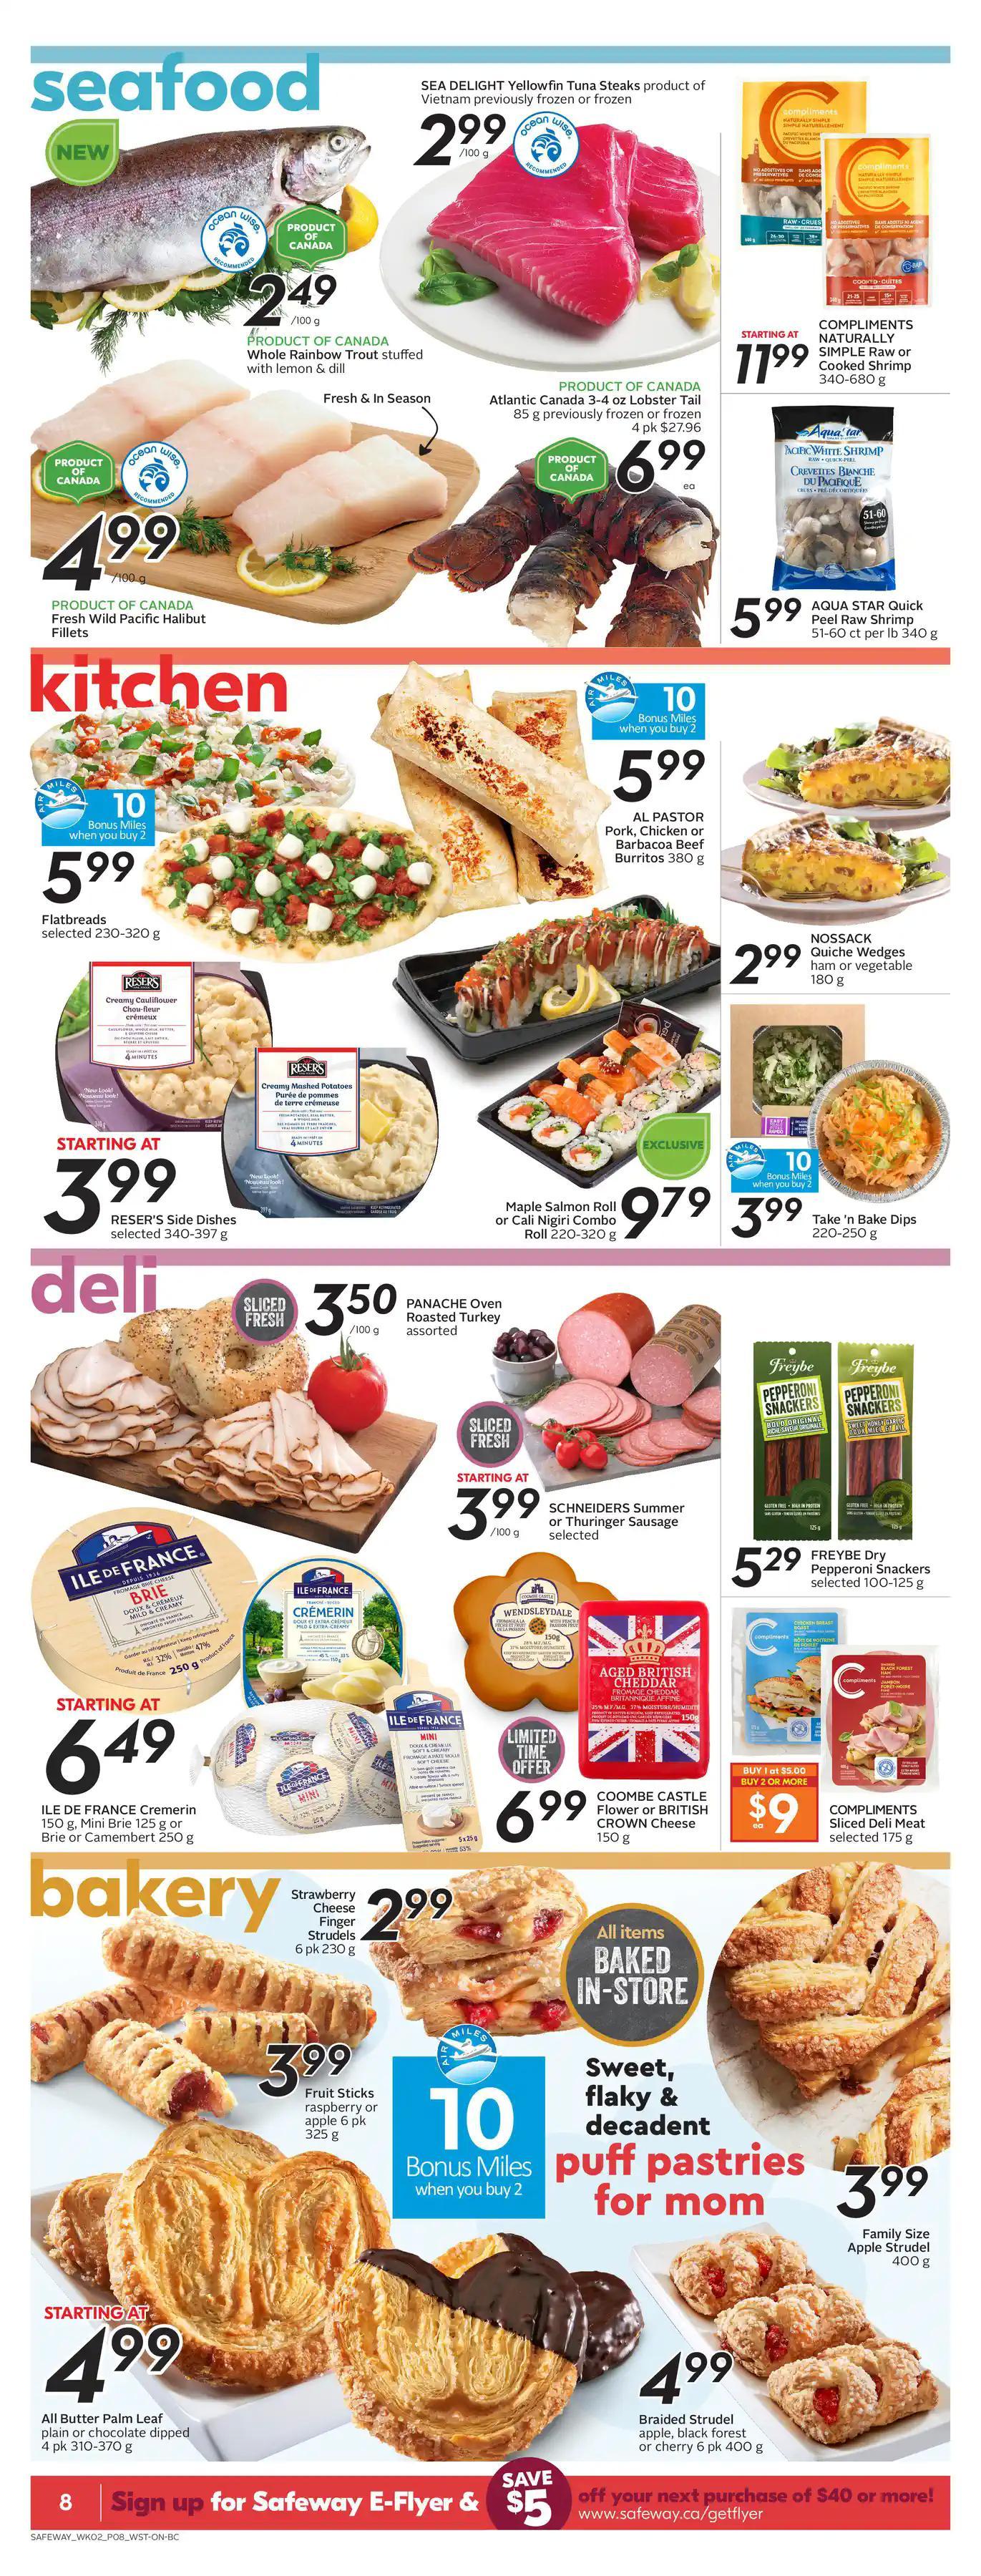 Safeway - Weekly Flyer Specials - Page 9